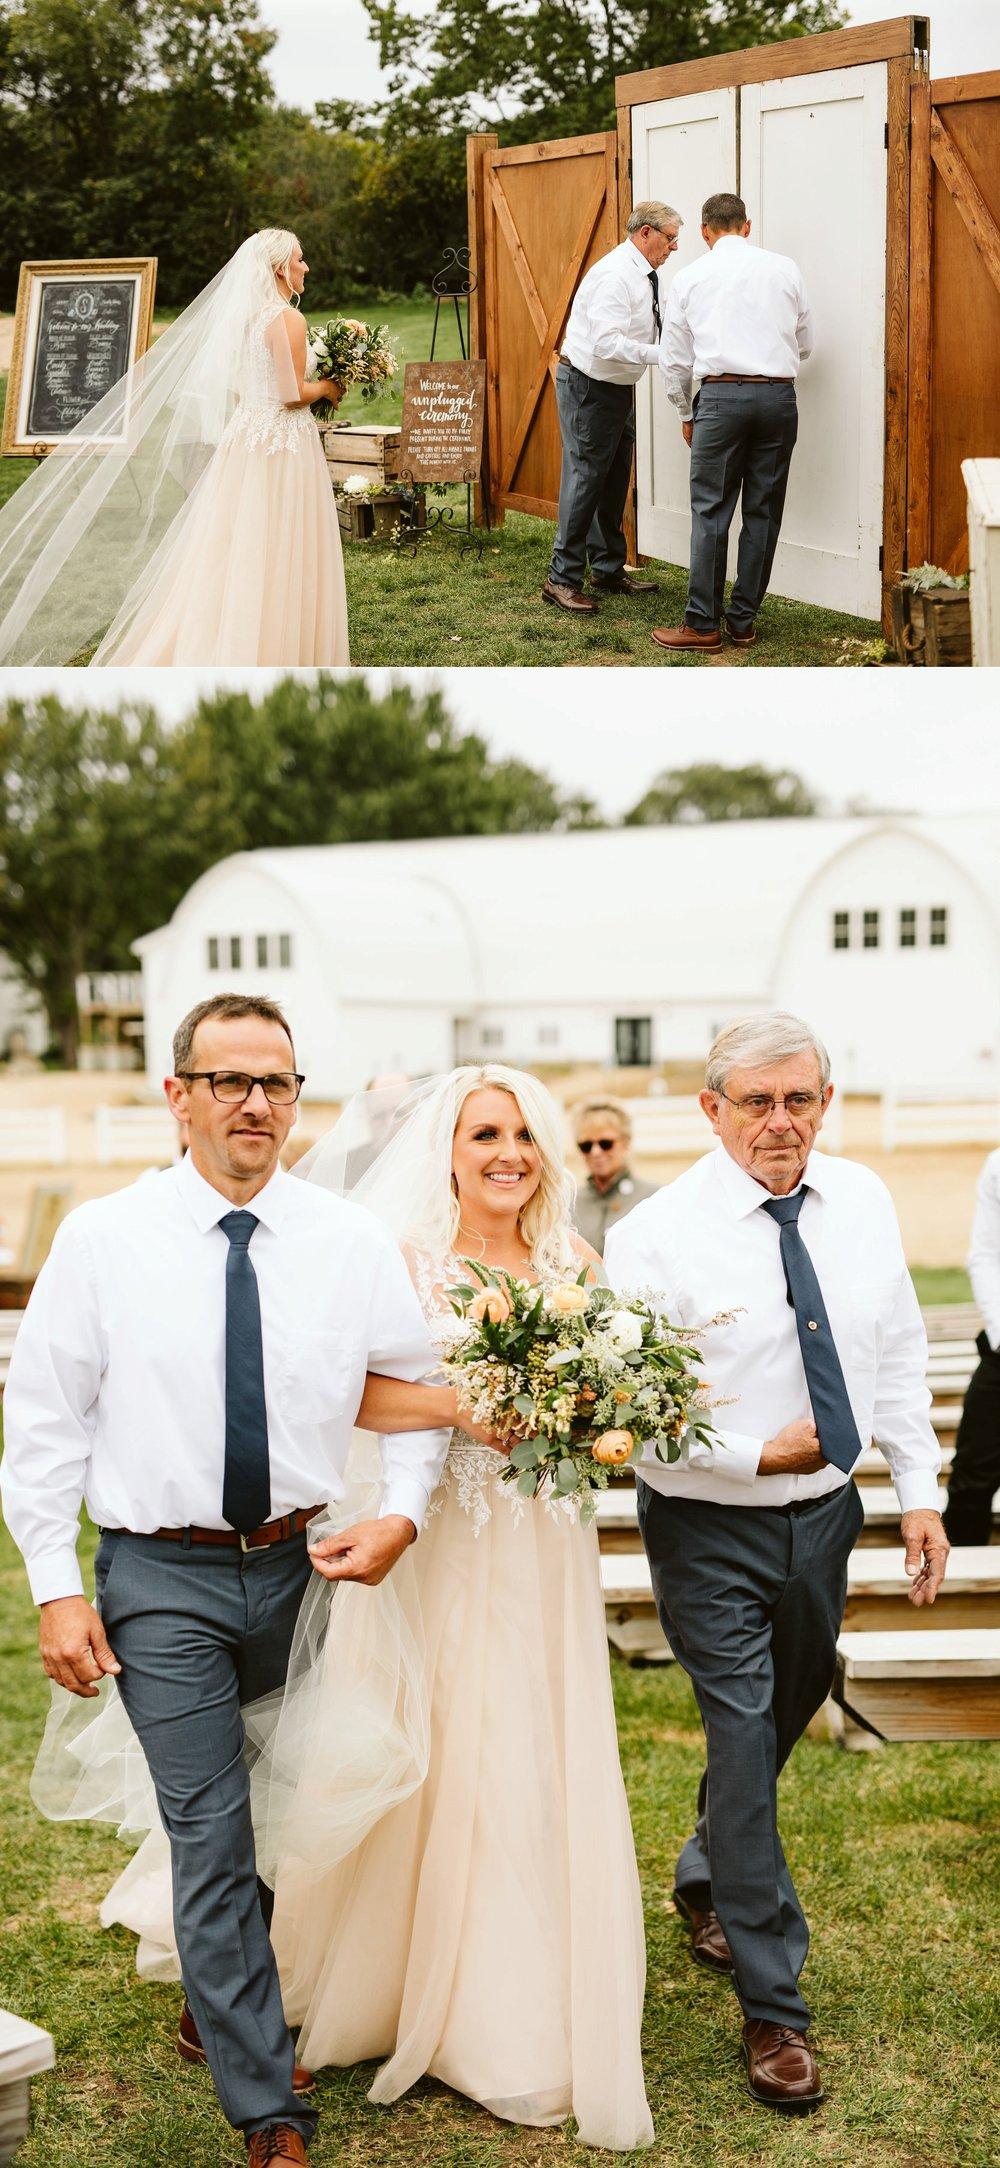 john-p-furber-farm-wedding-in-september-blush-and-coral-flowers-121.jpg